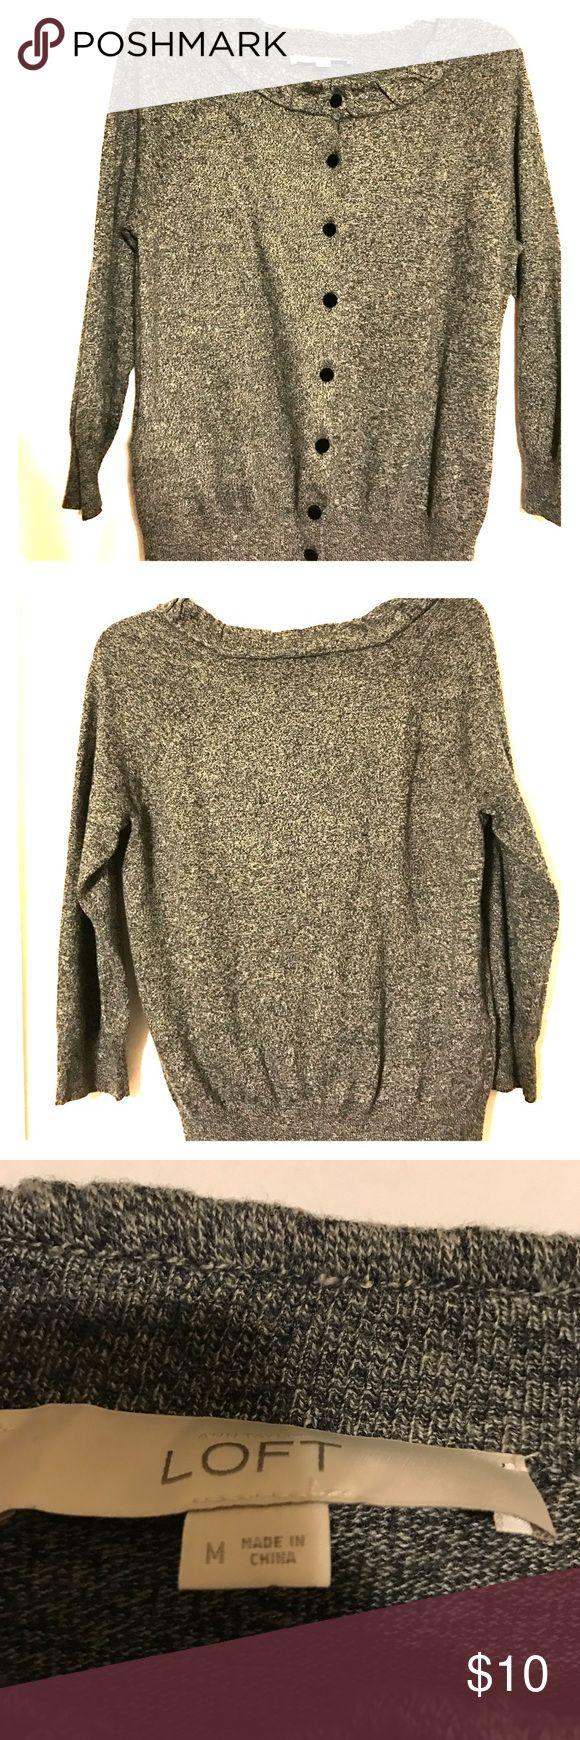 ‼️TODAY ONLY‼️ Anne Taylor Loft Cardigan Super soft & comfy cardigan LOFT Sweaters Cardigans